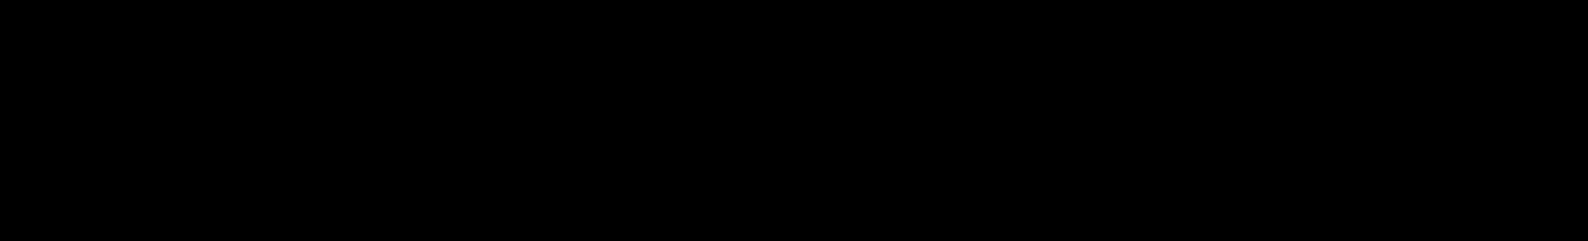 Museo 700 Italic